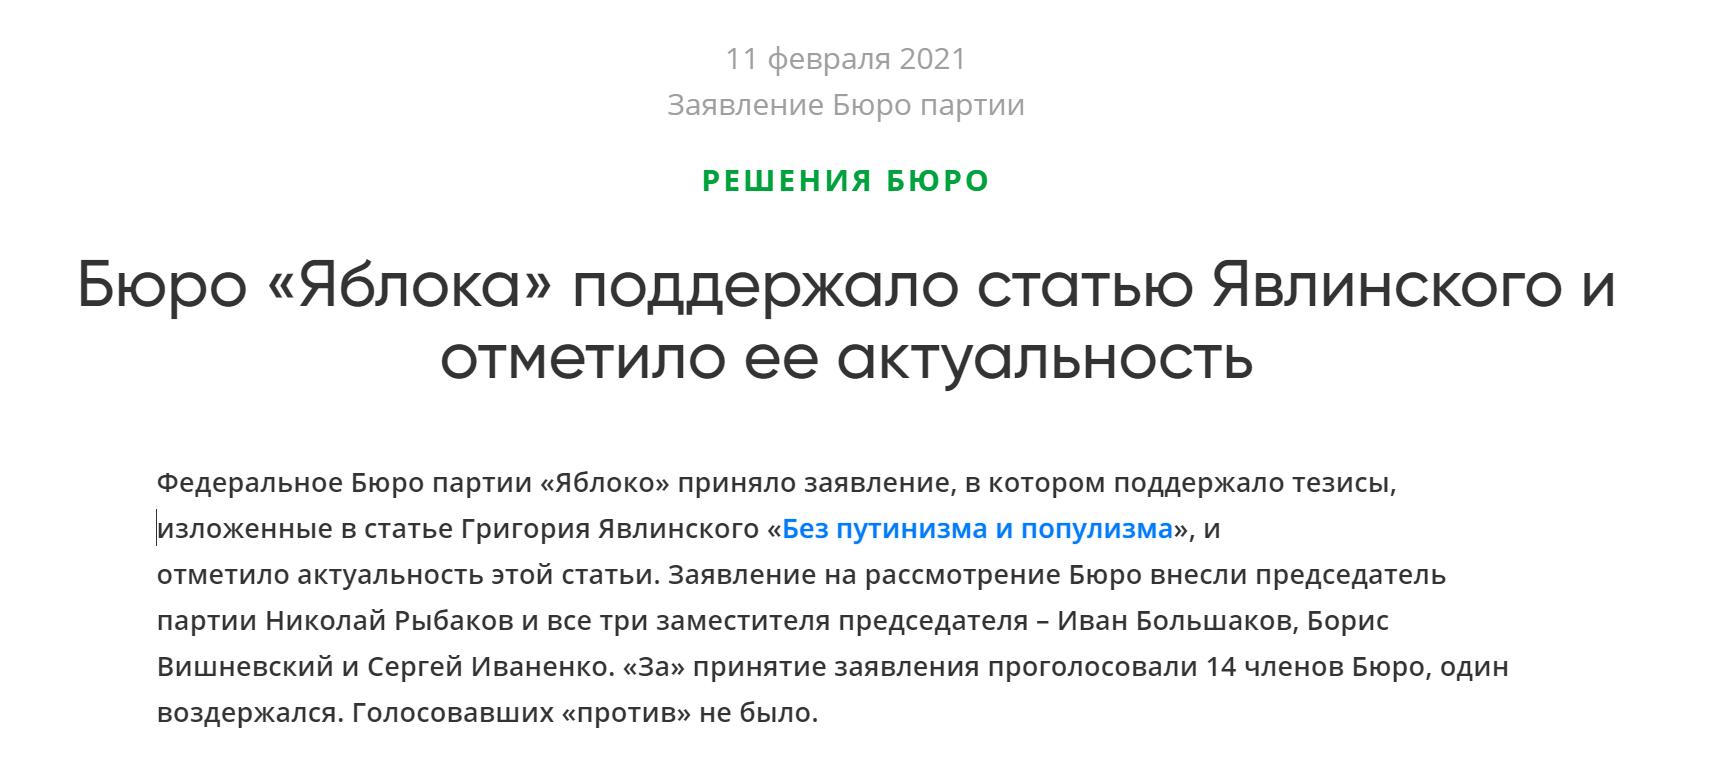 Яблоко не равно Явлинский - говорили они...